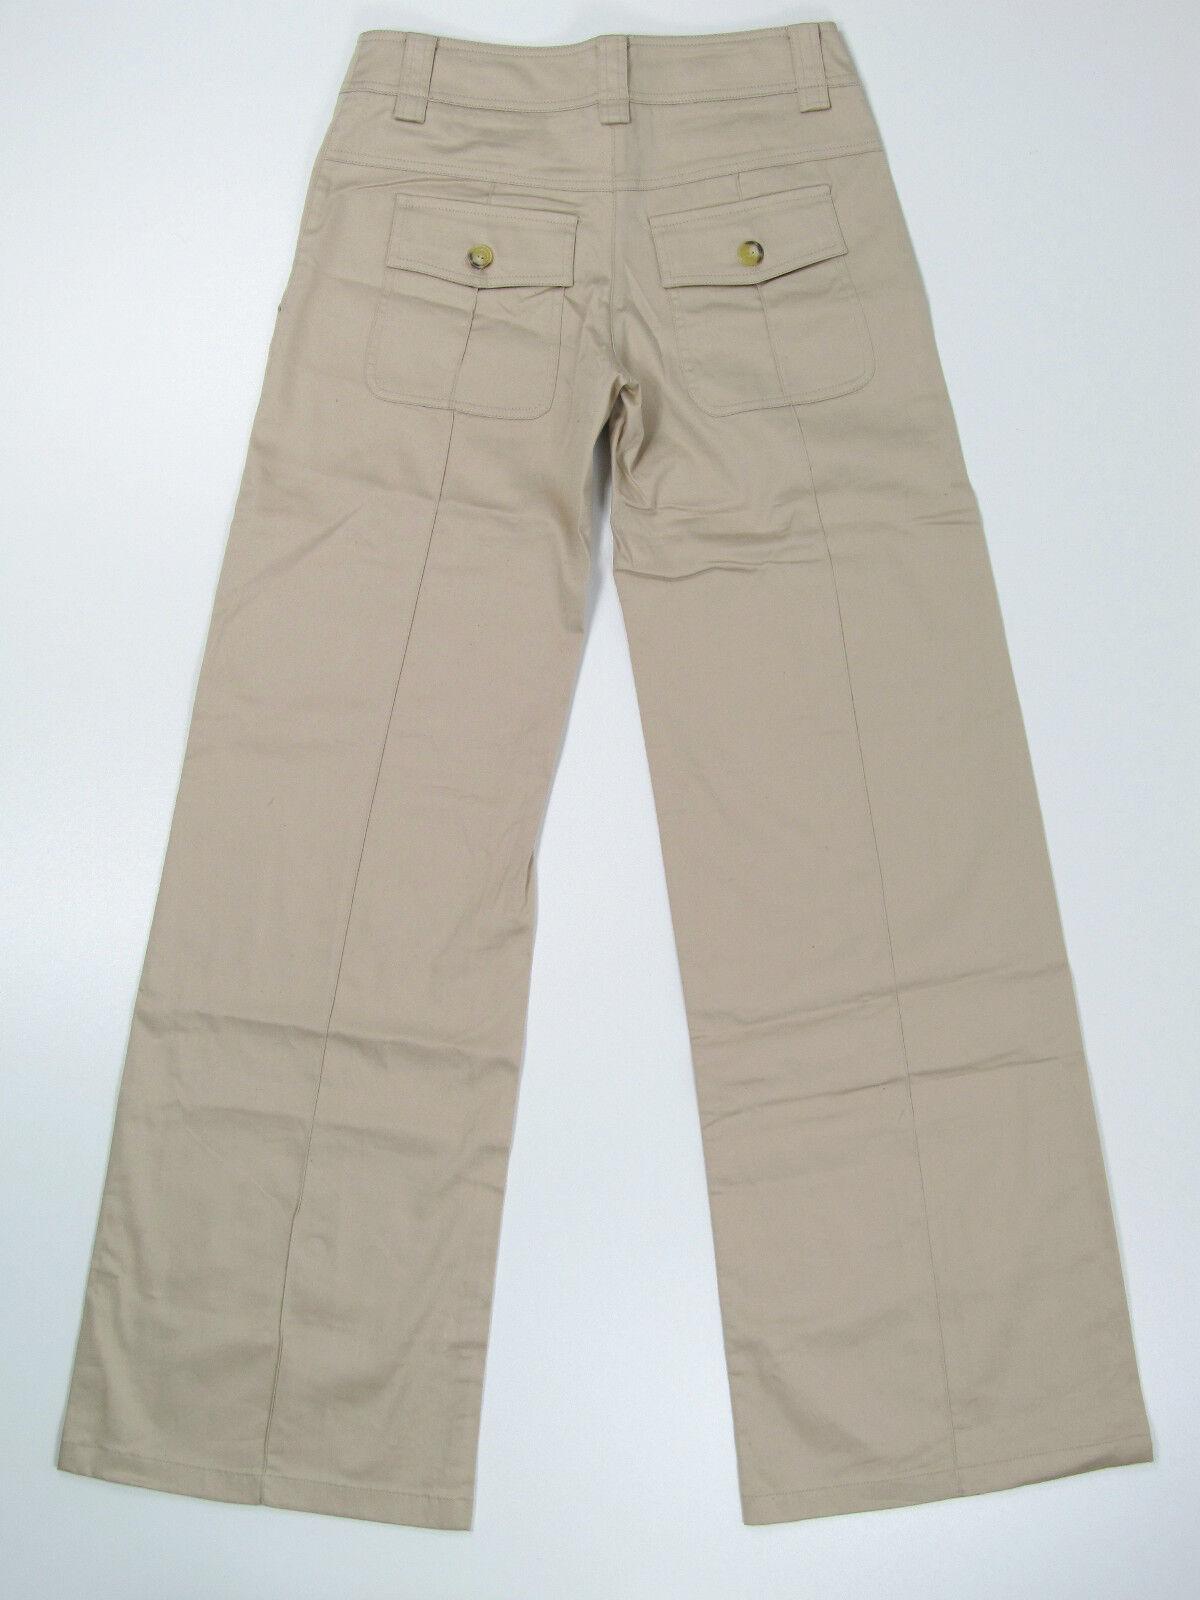 Patrizia Pepe Pantalon Hose Pants Pants Pants Jeans Neu 36 38 dbcc4a